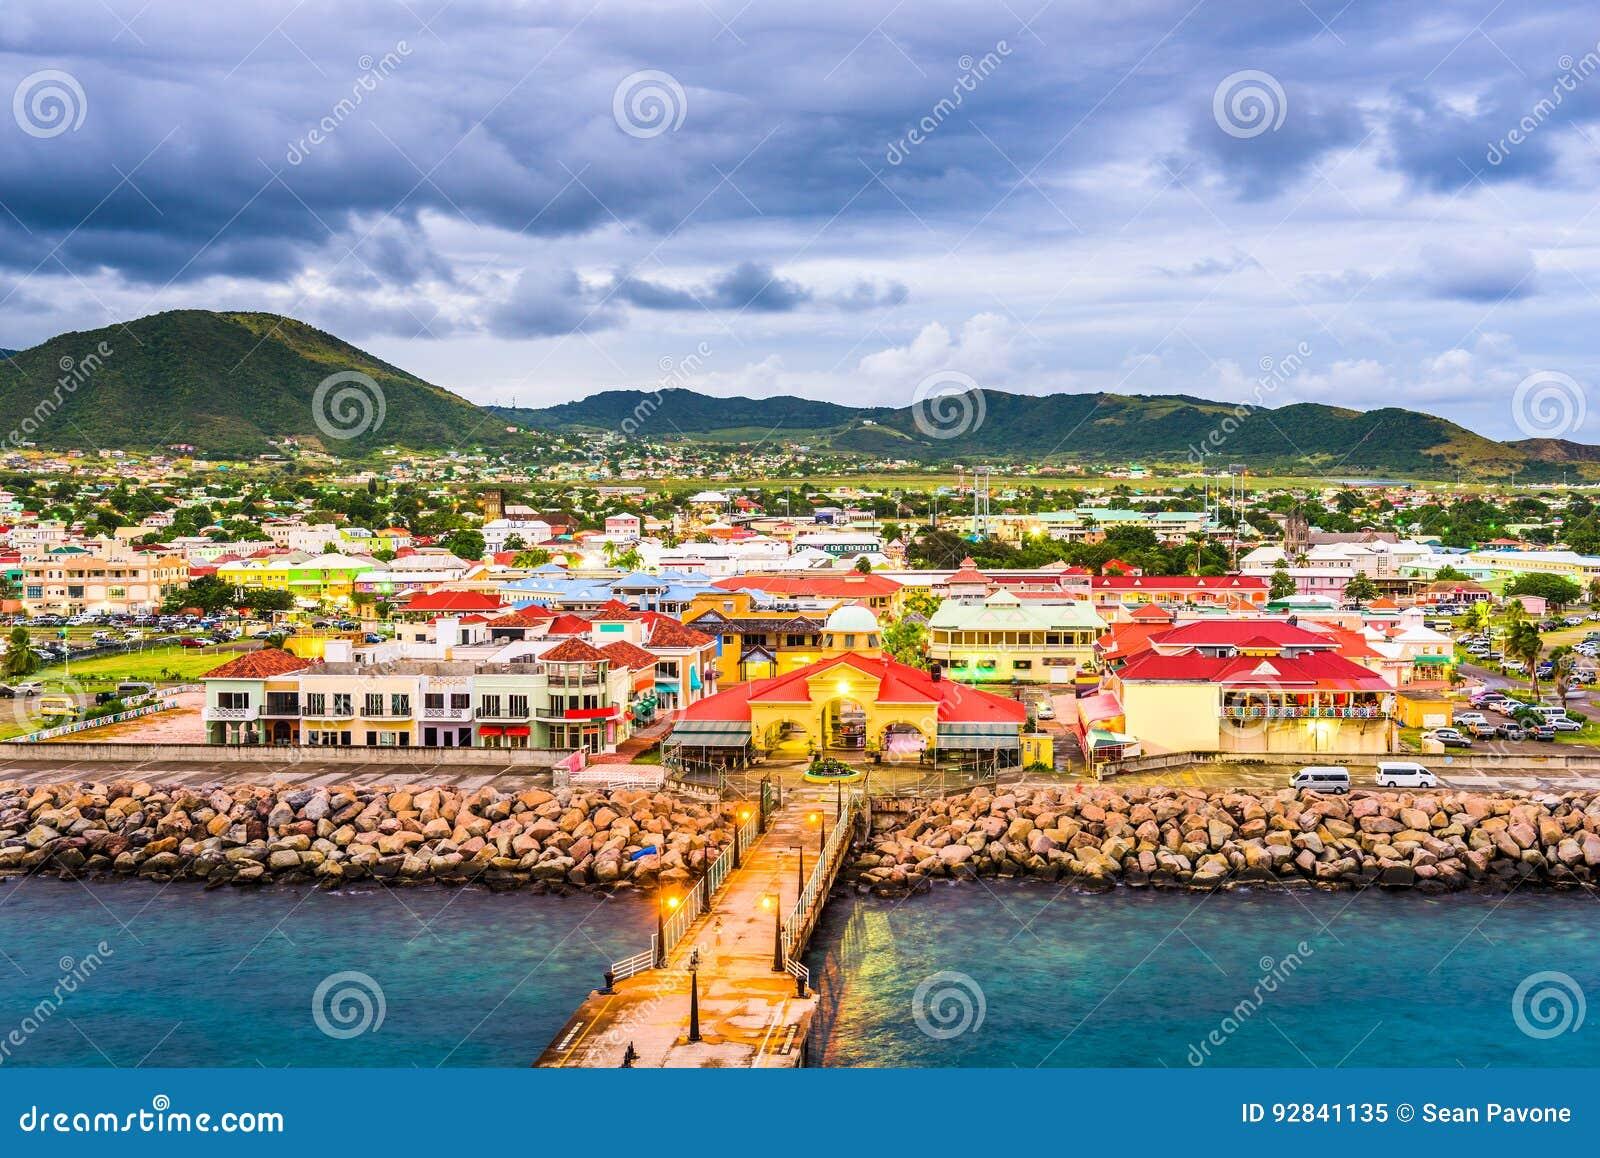 Basseterre St Kitts Stock Image Image Of Indies Scene 92841135